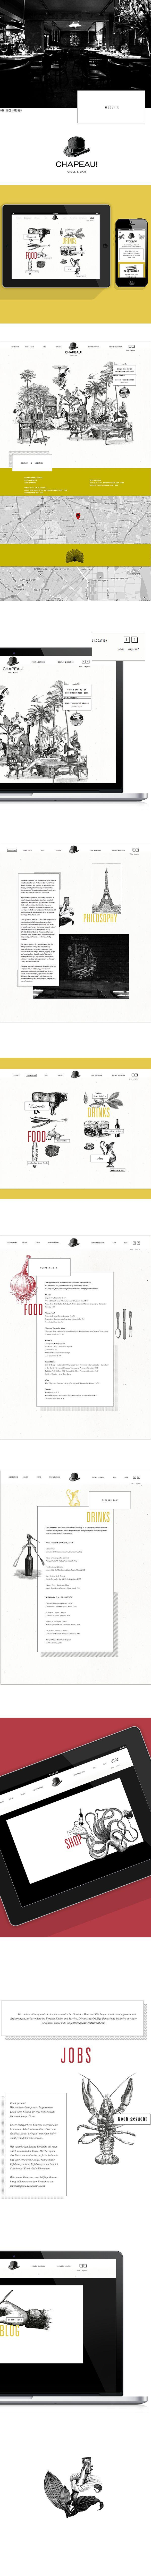 CHAPEAU! Grill & Bar Website by Sonja Klements, via Behance